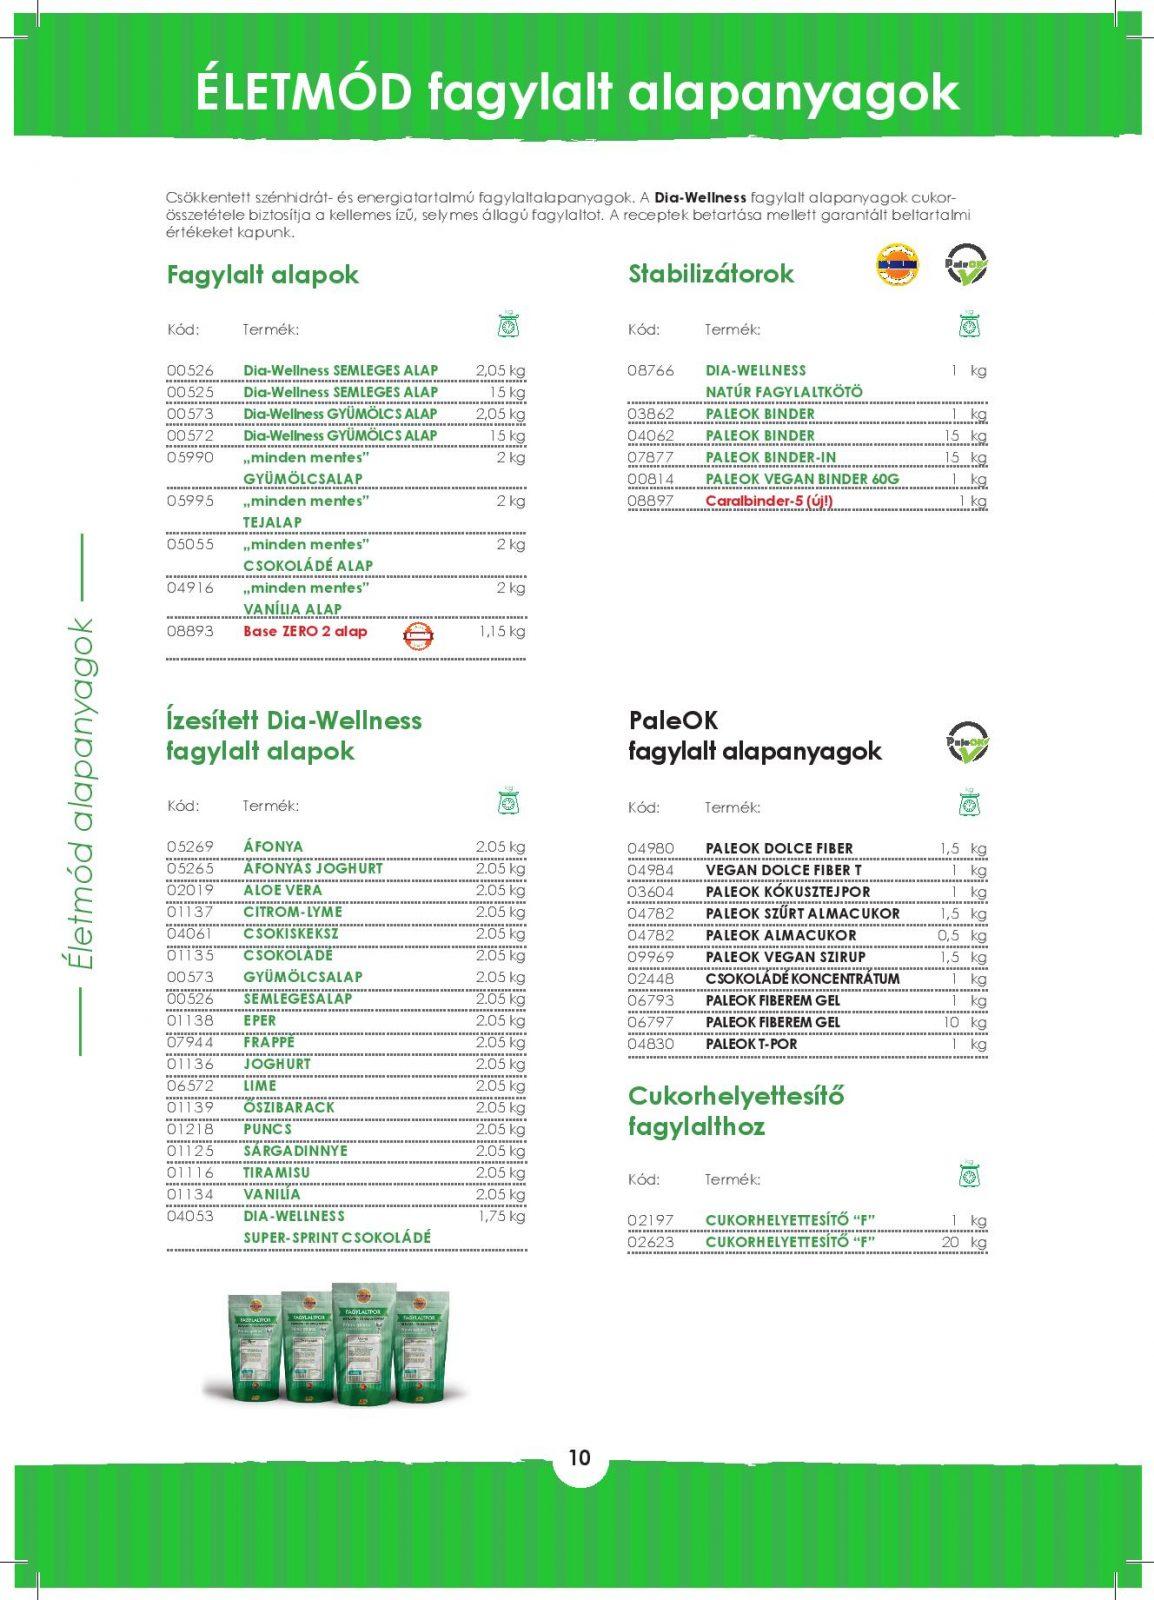 FAGYLALTKATALOGUS_2021_PRINT-page-010